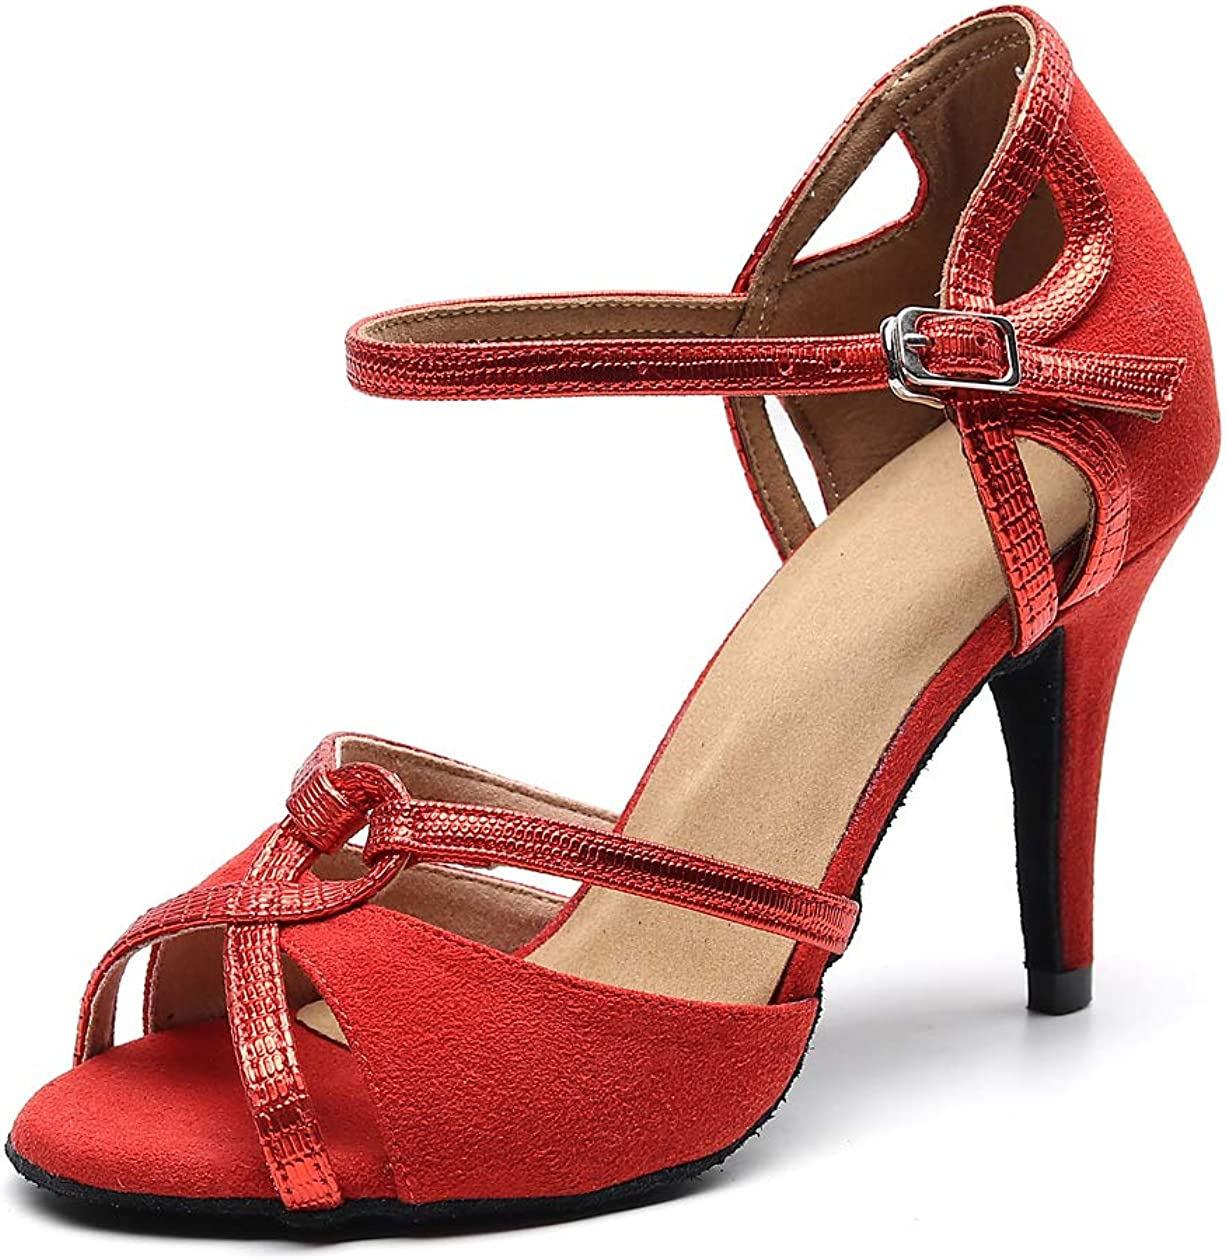 Goettin Ballroom Satin Professional Salsa Dancer Shoes Female 3.